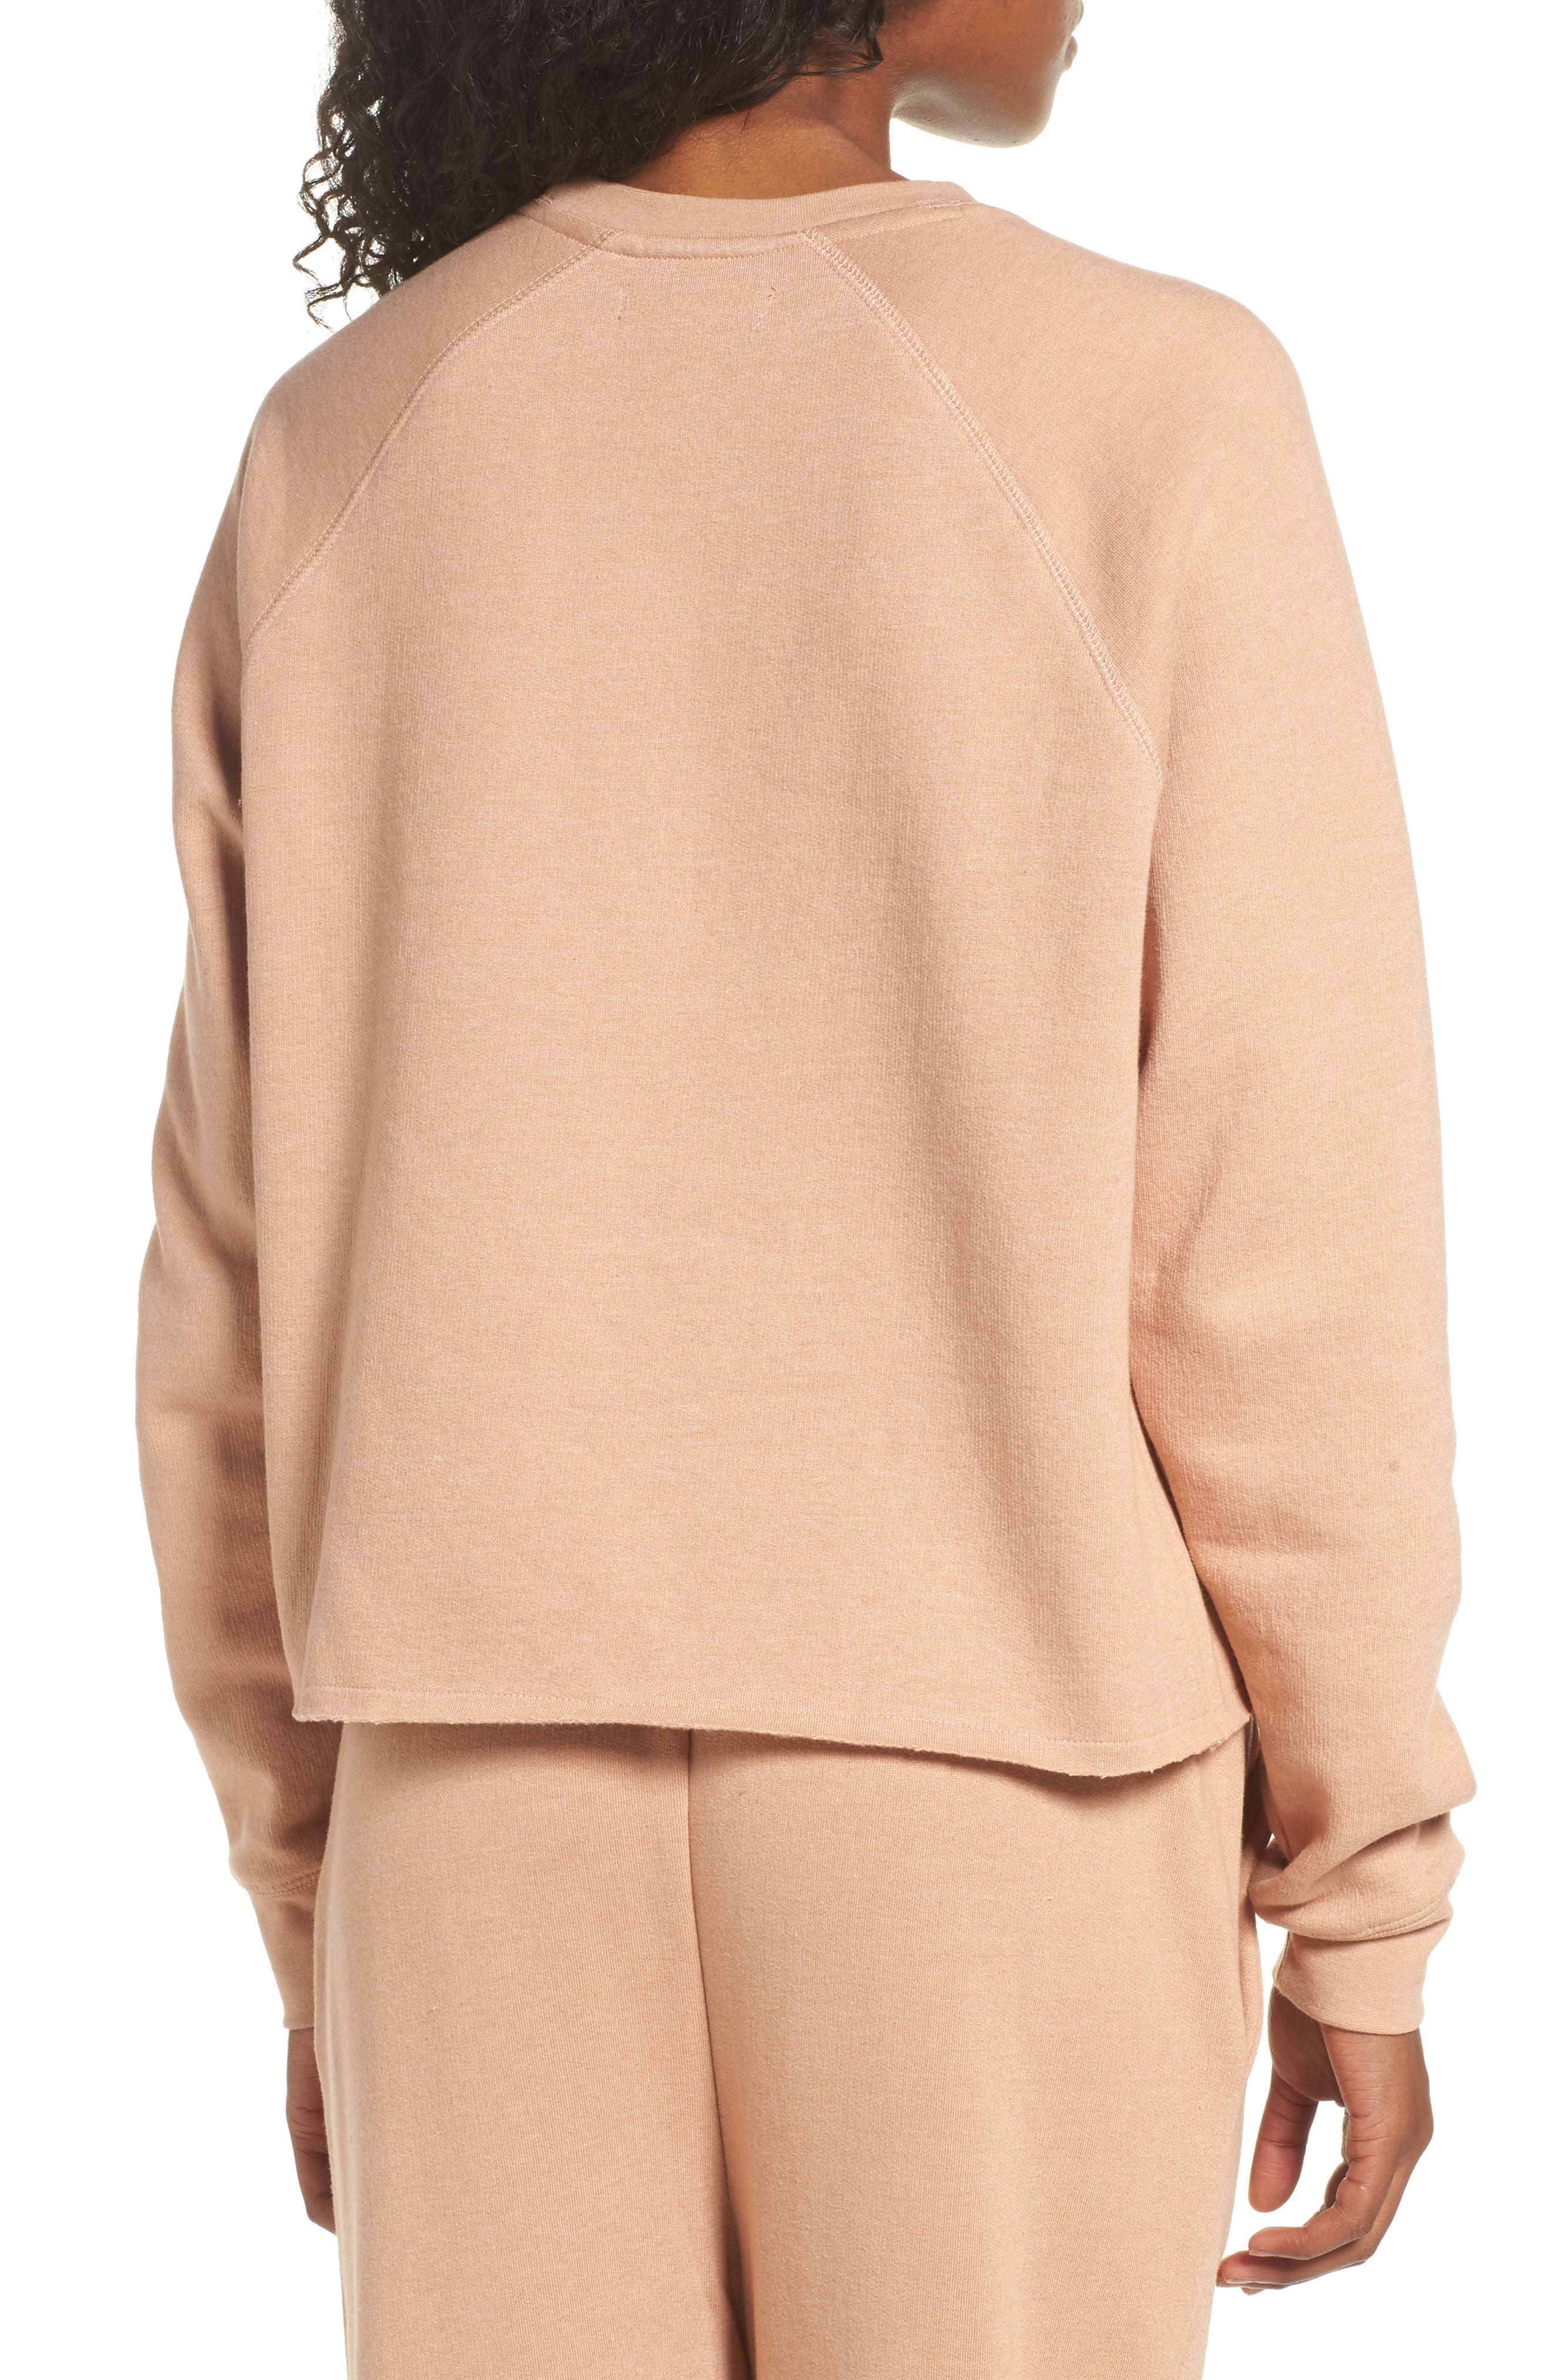 Middle Sister Brunette Sweatshirt,                             Alternate thumbnail 2, color,                             Rose